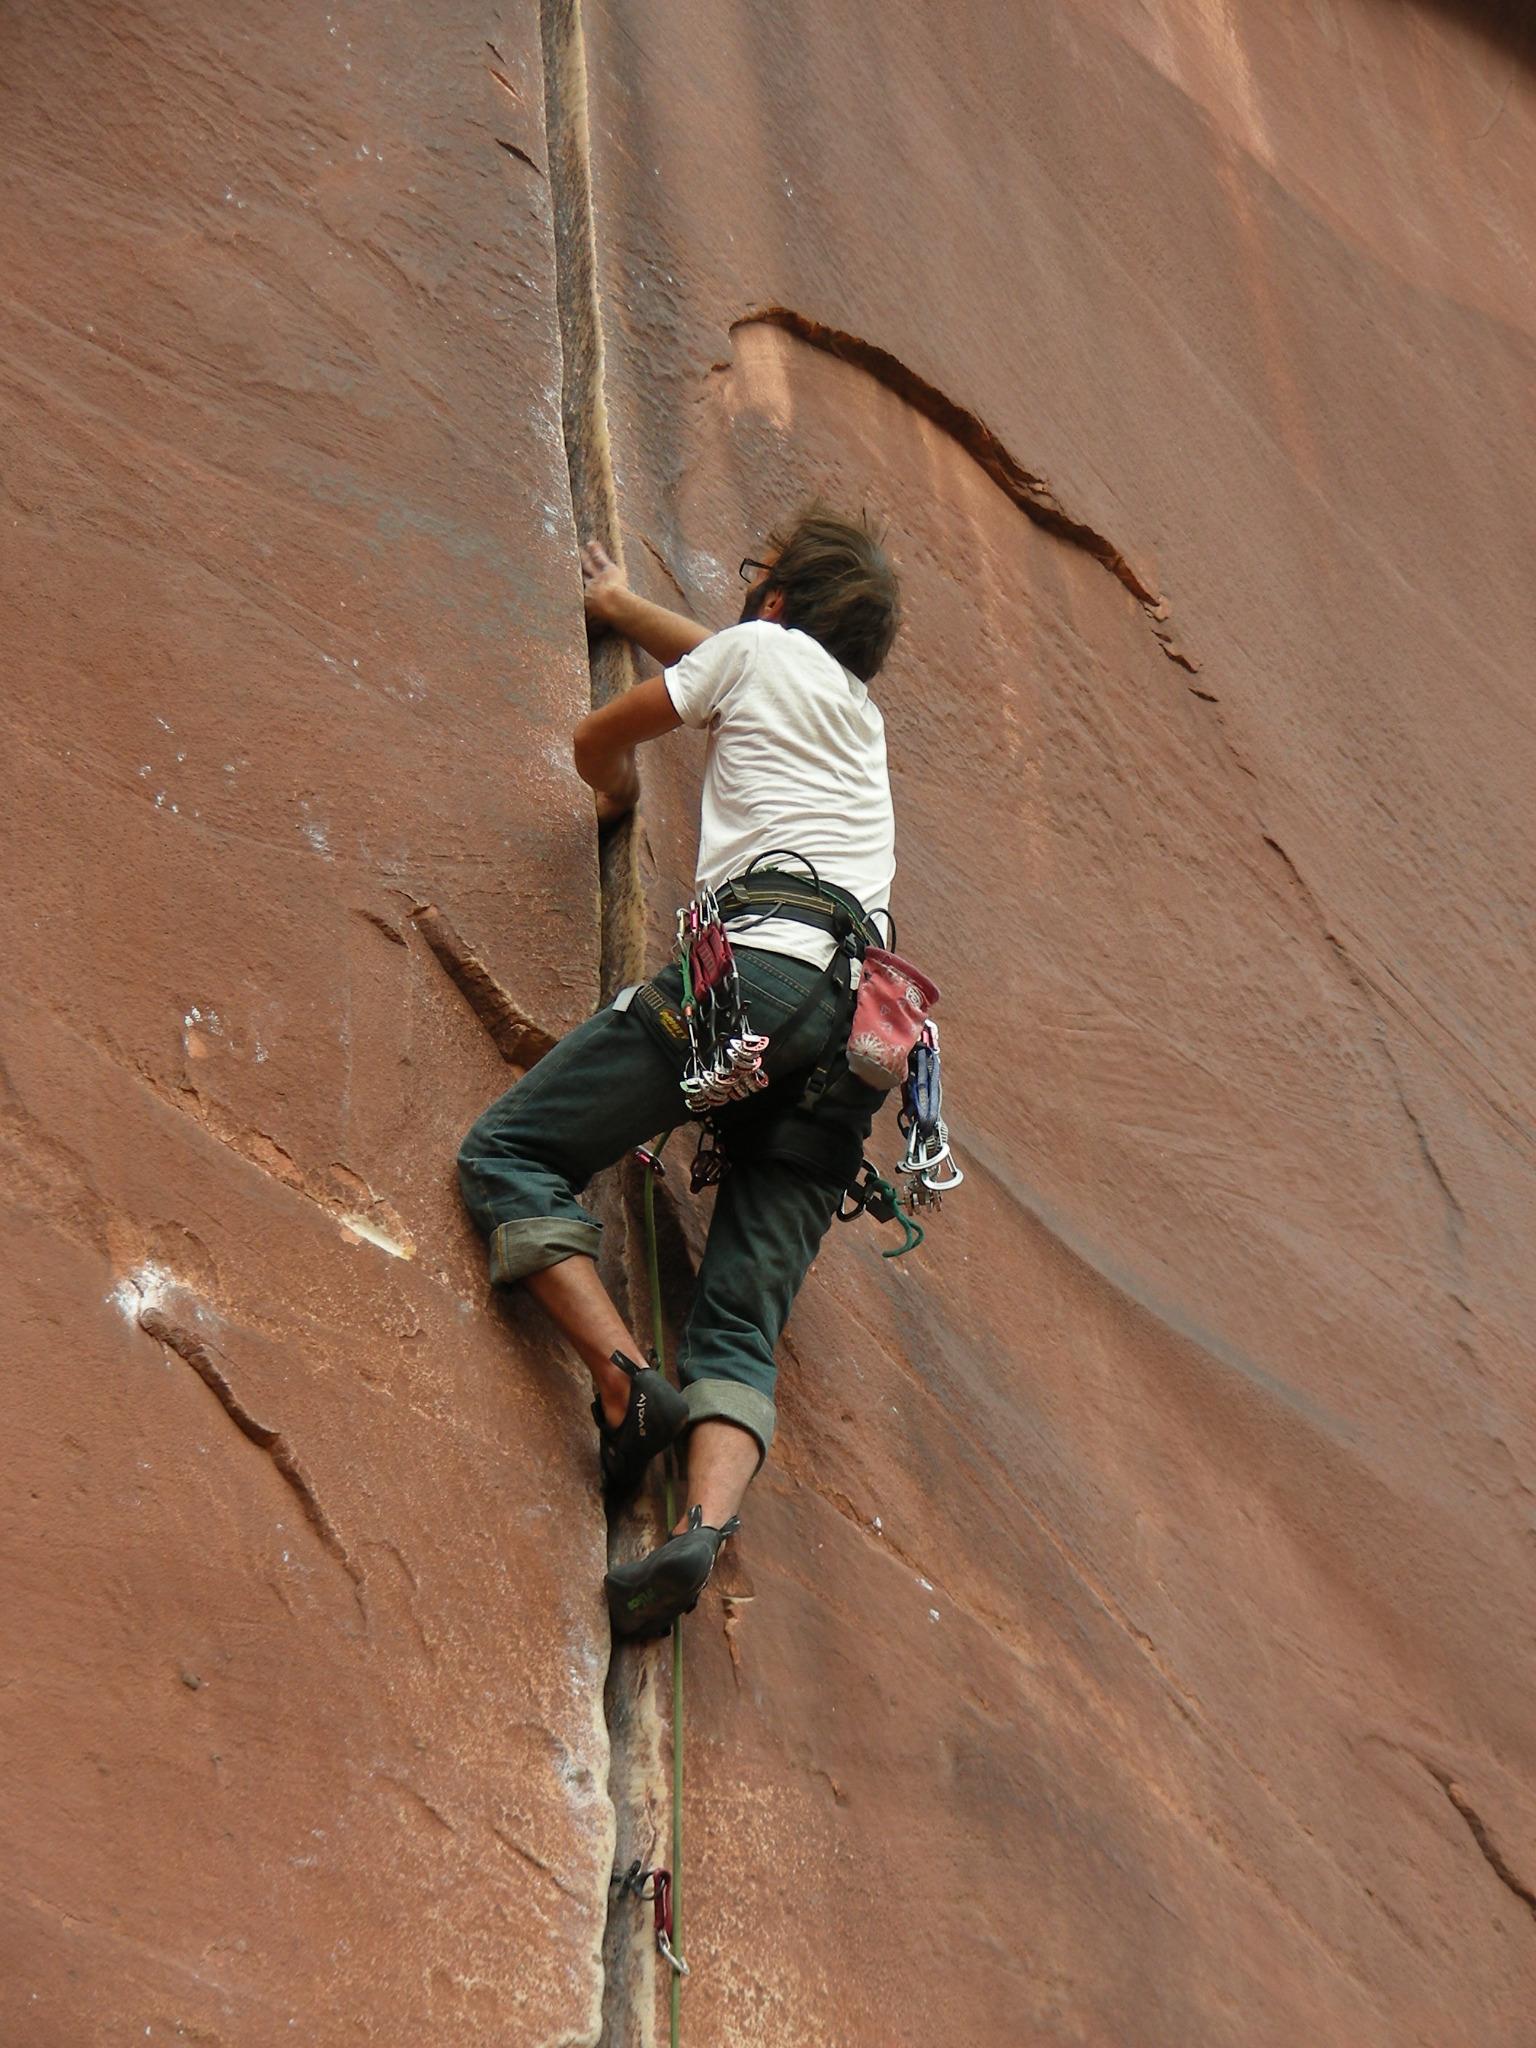 Crack climbing  Wikipedia